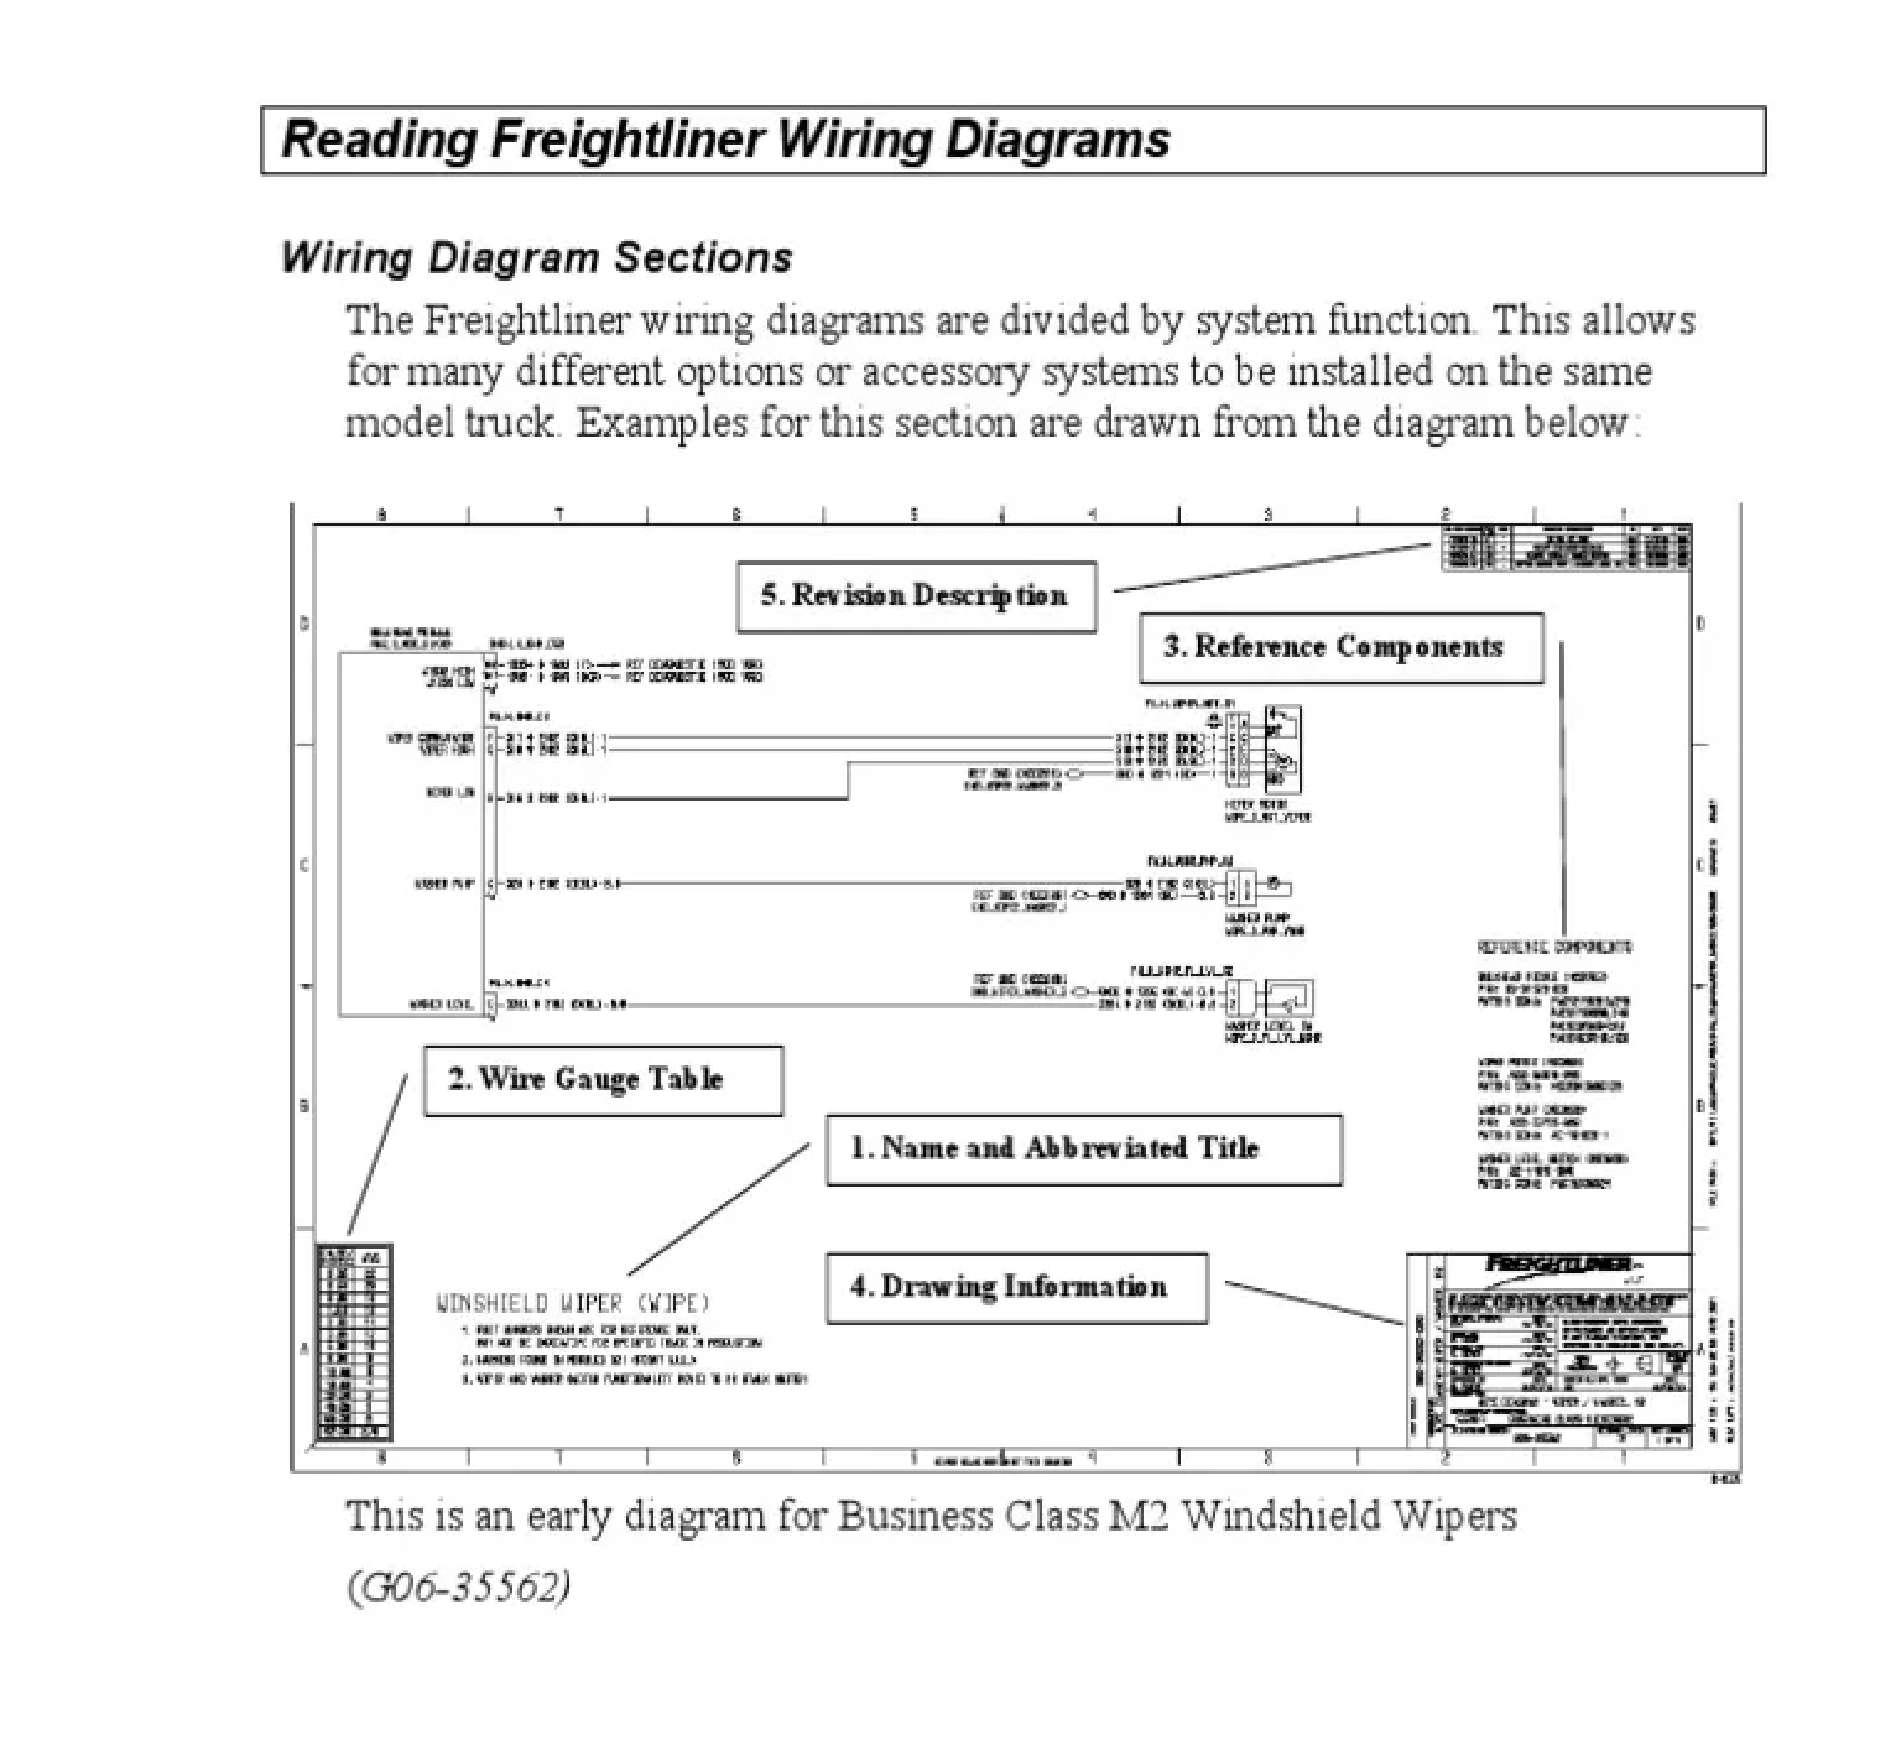 Freightliner Service Literature - Repair information, wiring diagrams SS-01